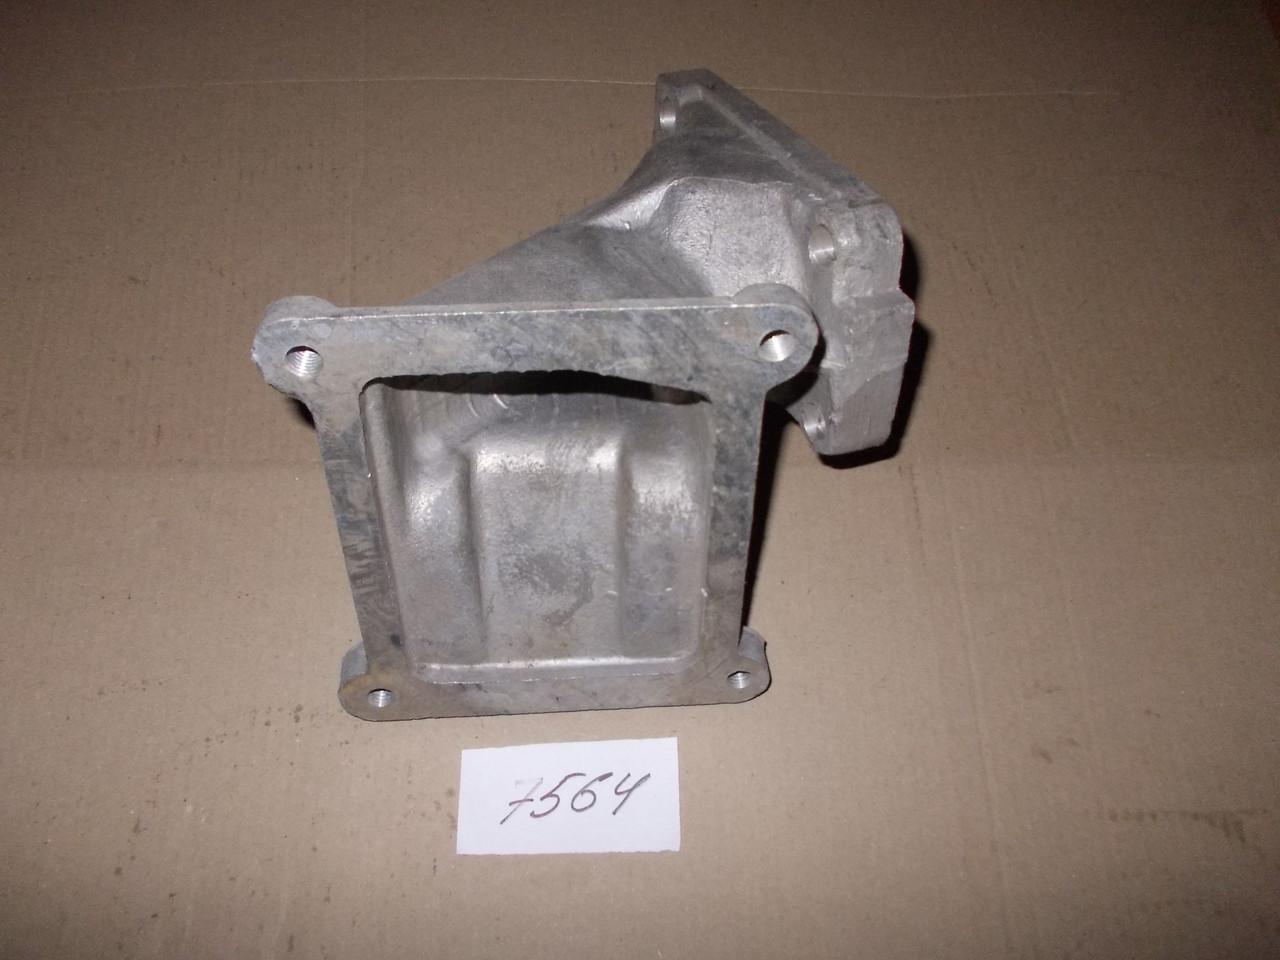 Кронштейн компрессора СМД-60, каталожный № 60-29009.00